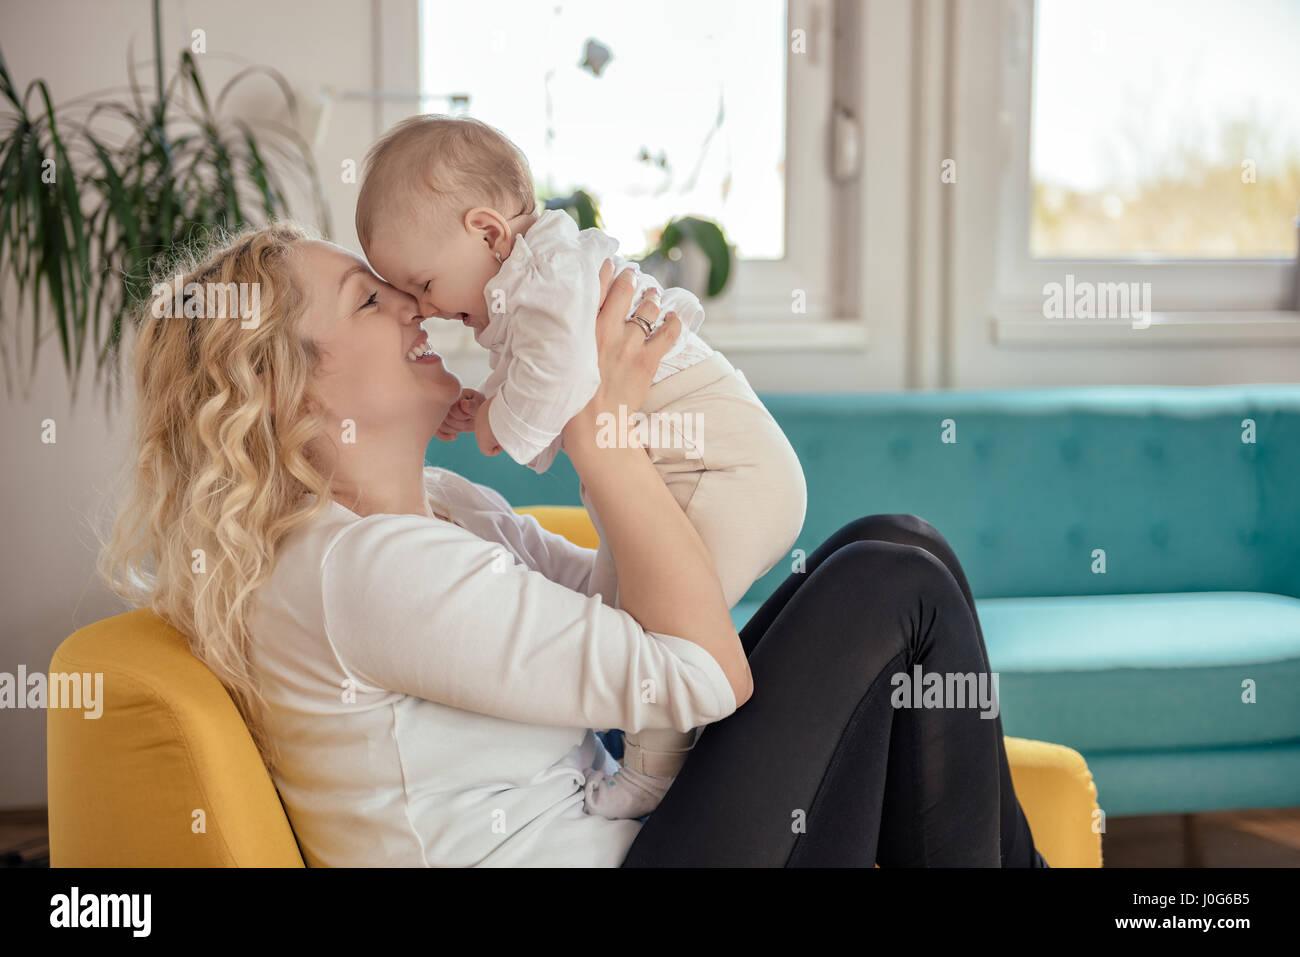 Mutter und Baby Kopf-an-Kopf sitzen am gelben Sessel Stockbild